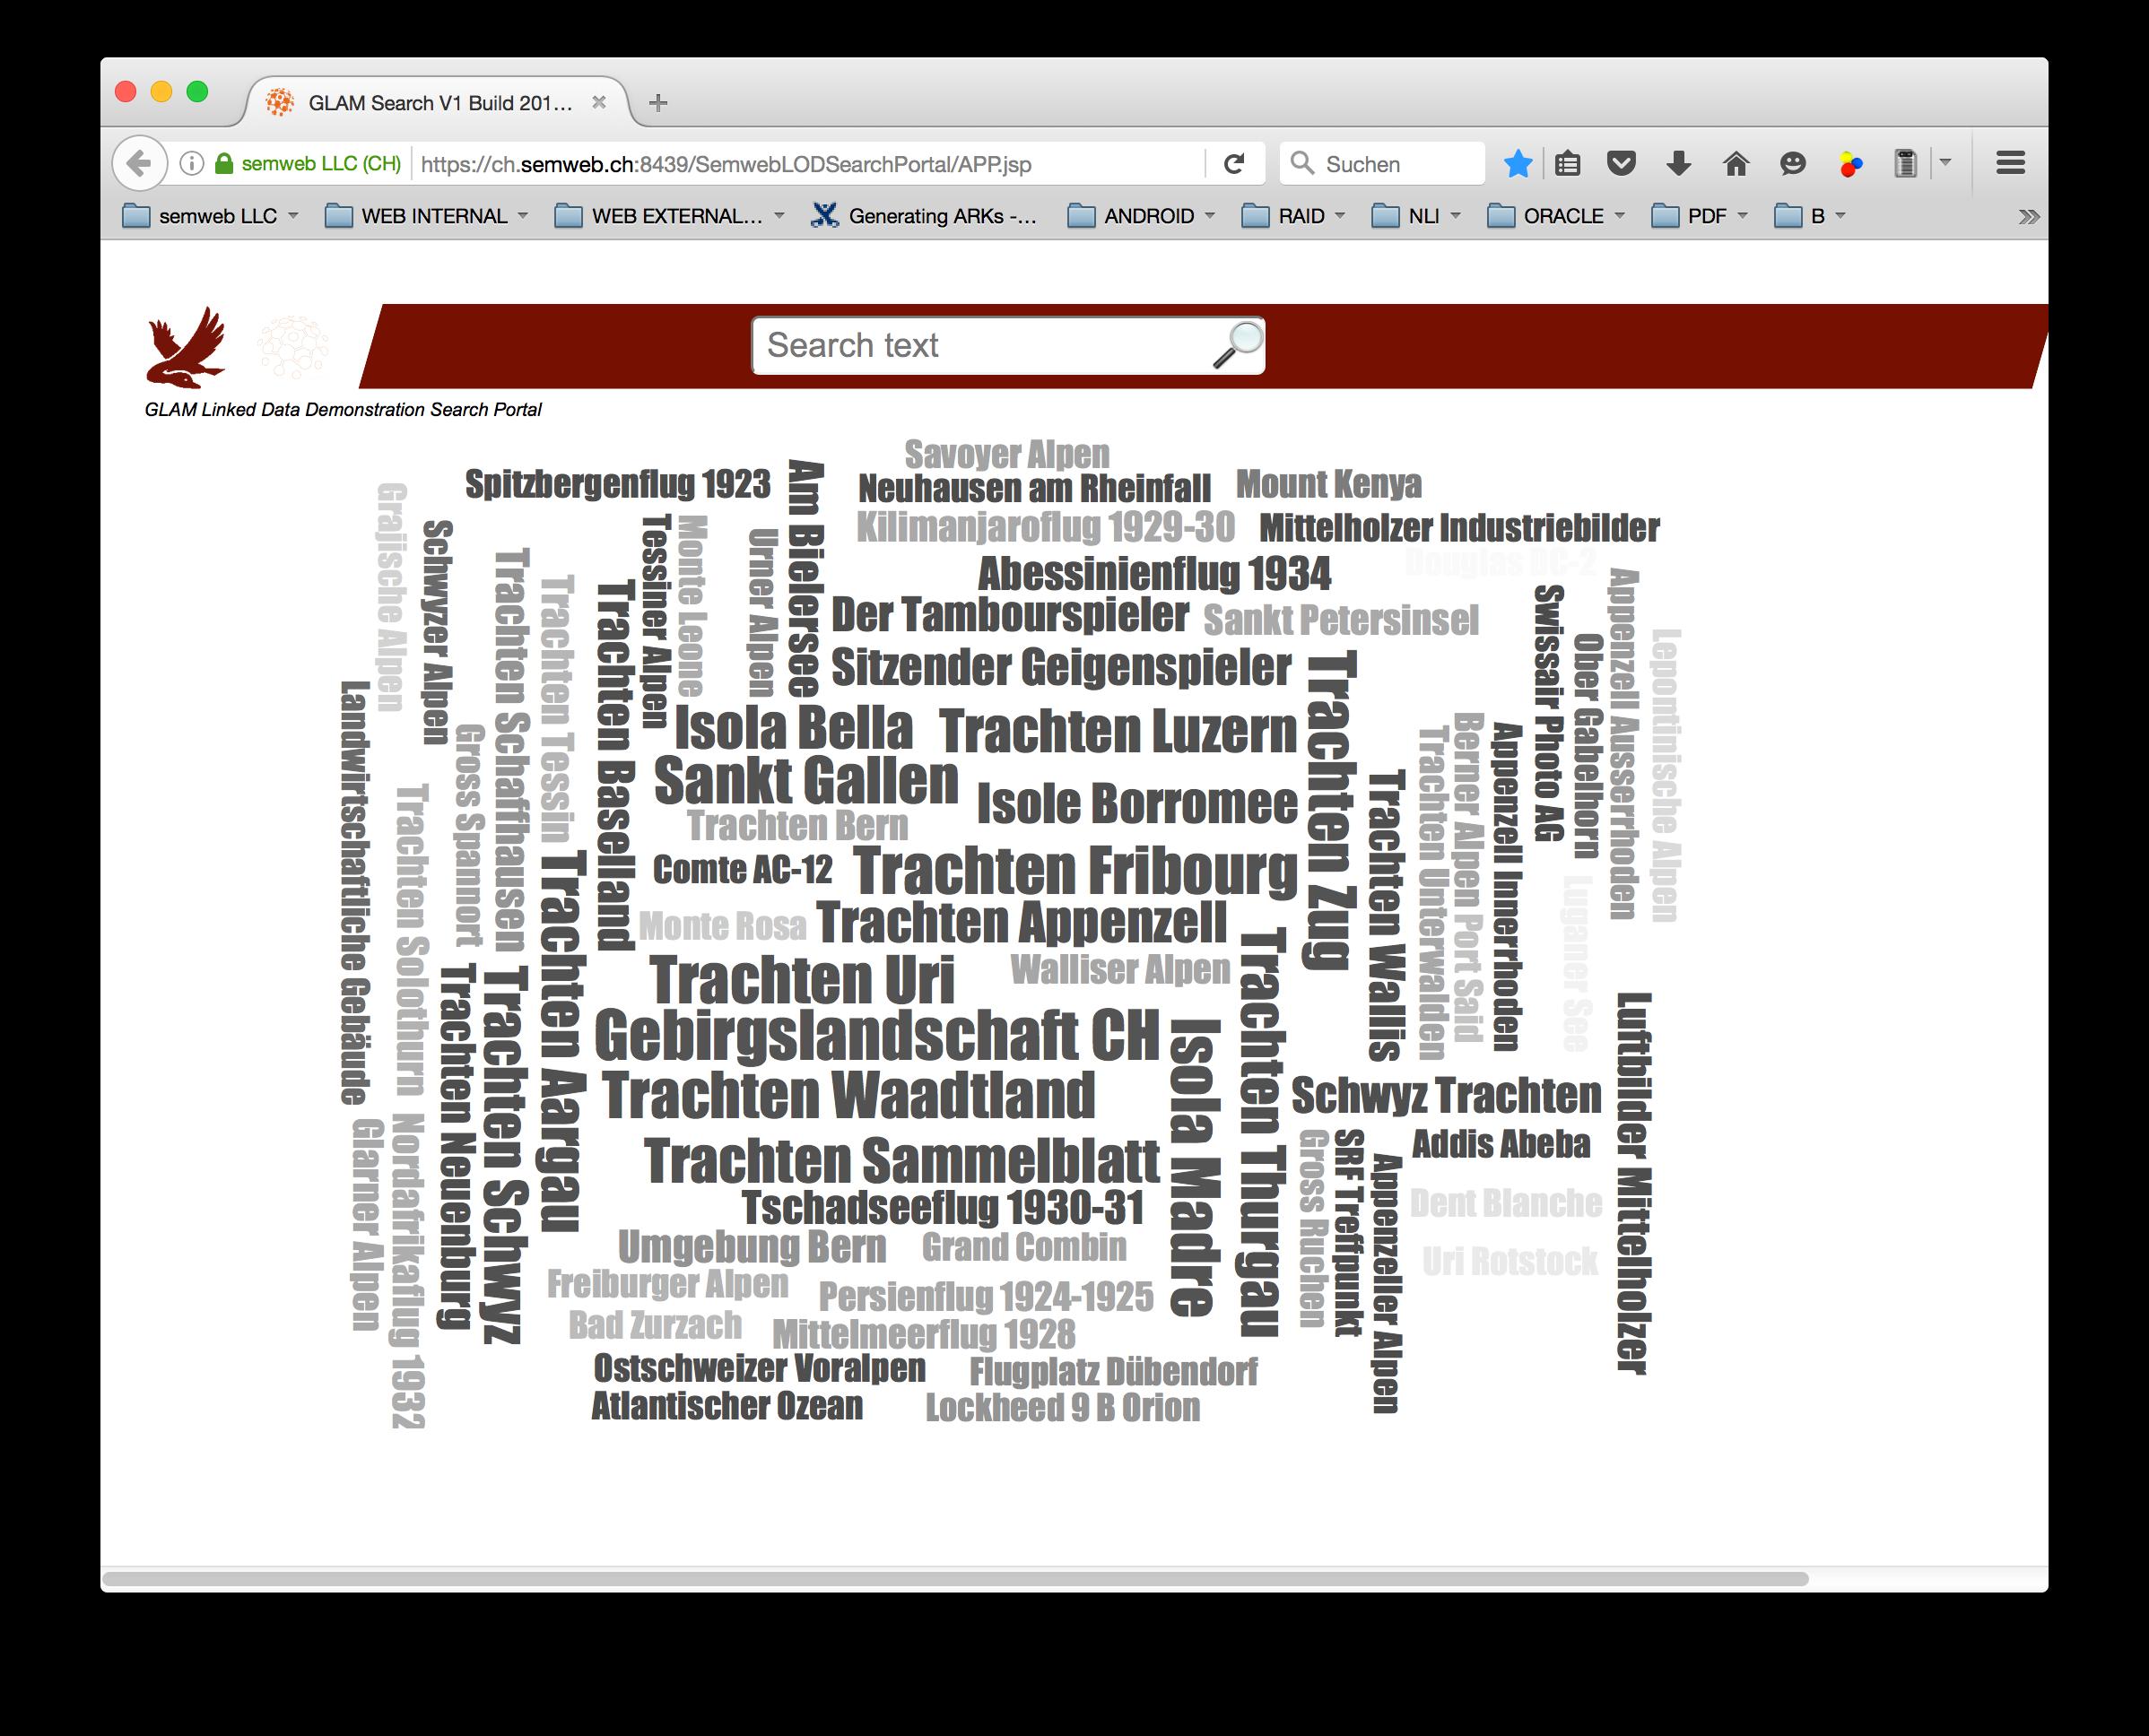 GLAM RDF Search Portal